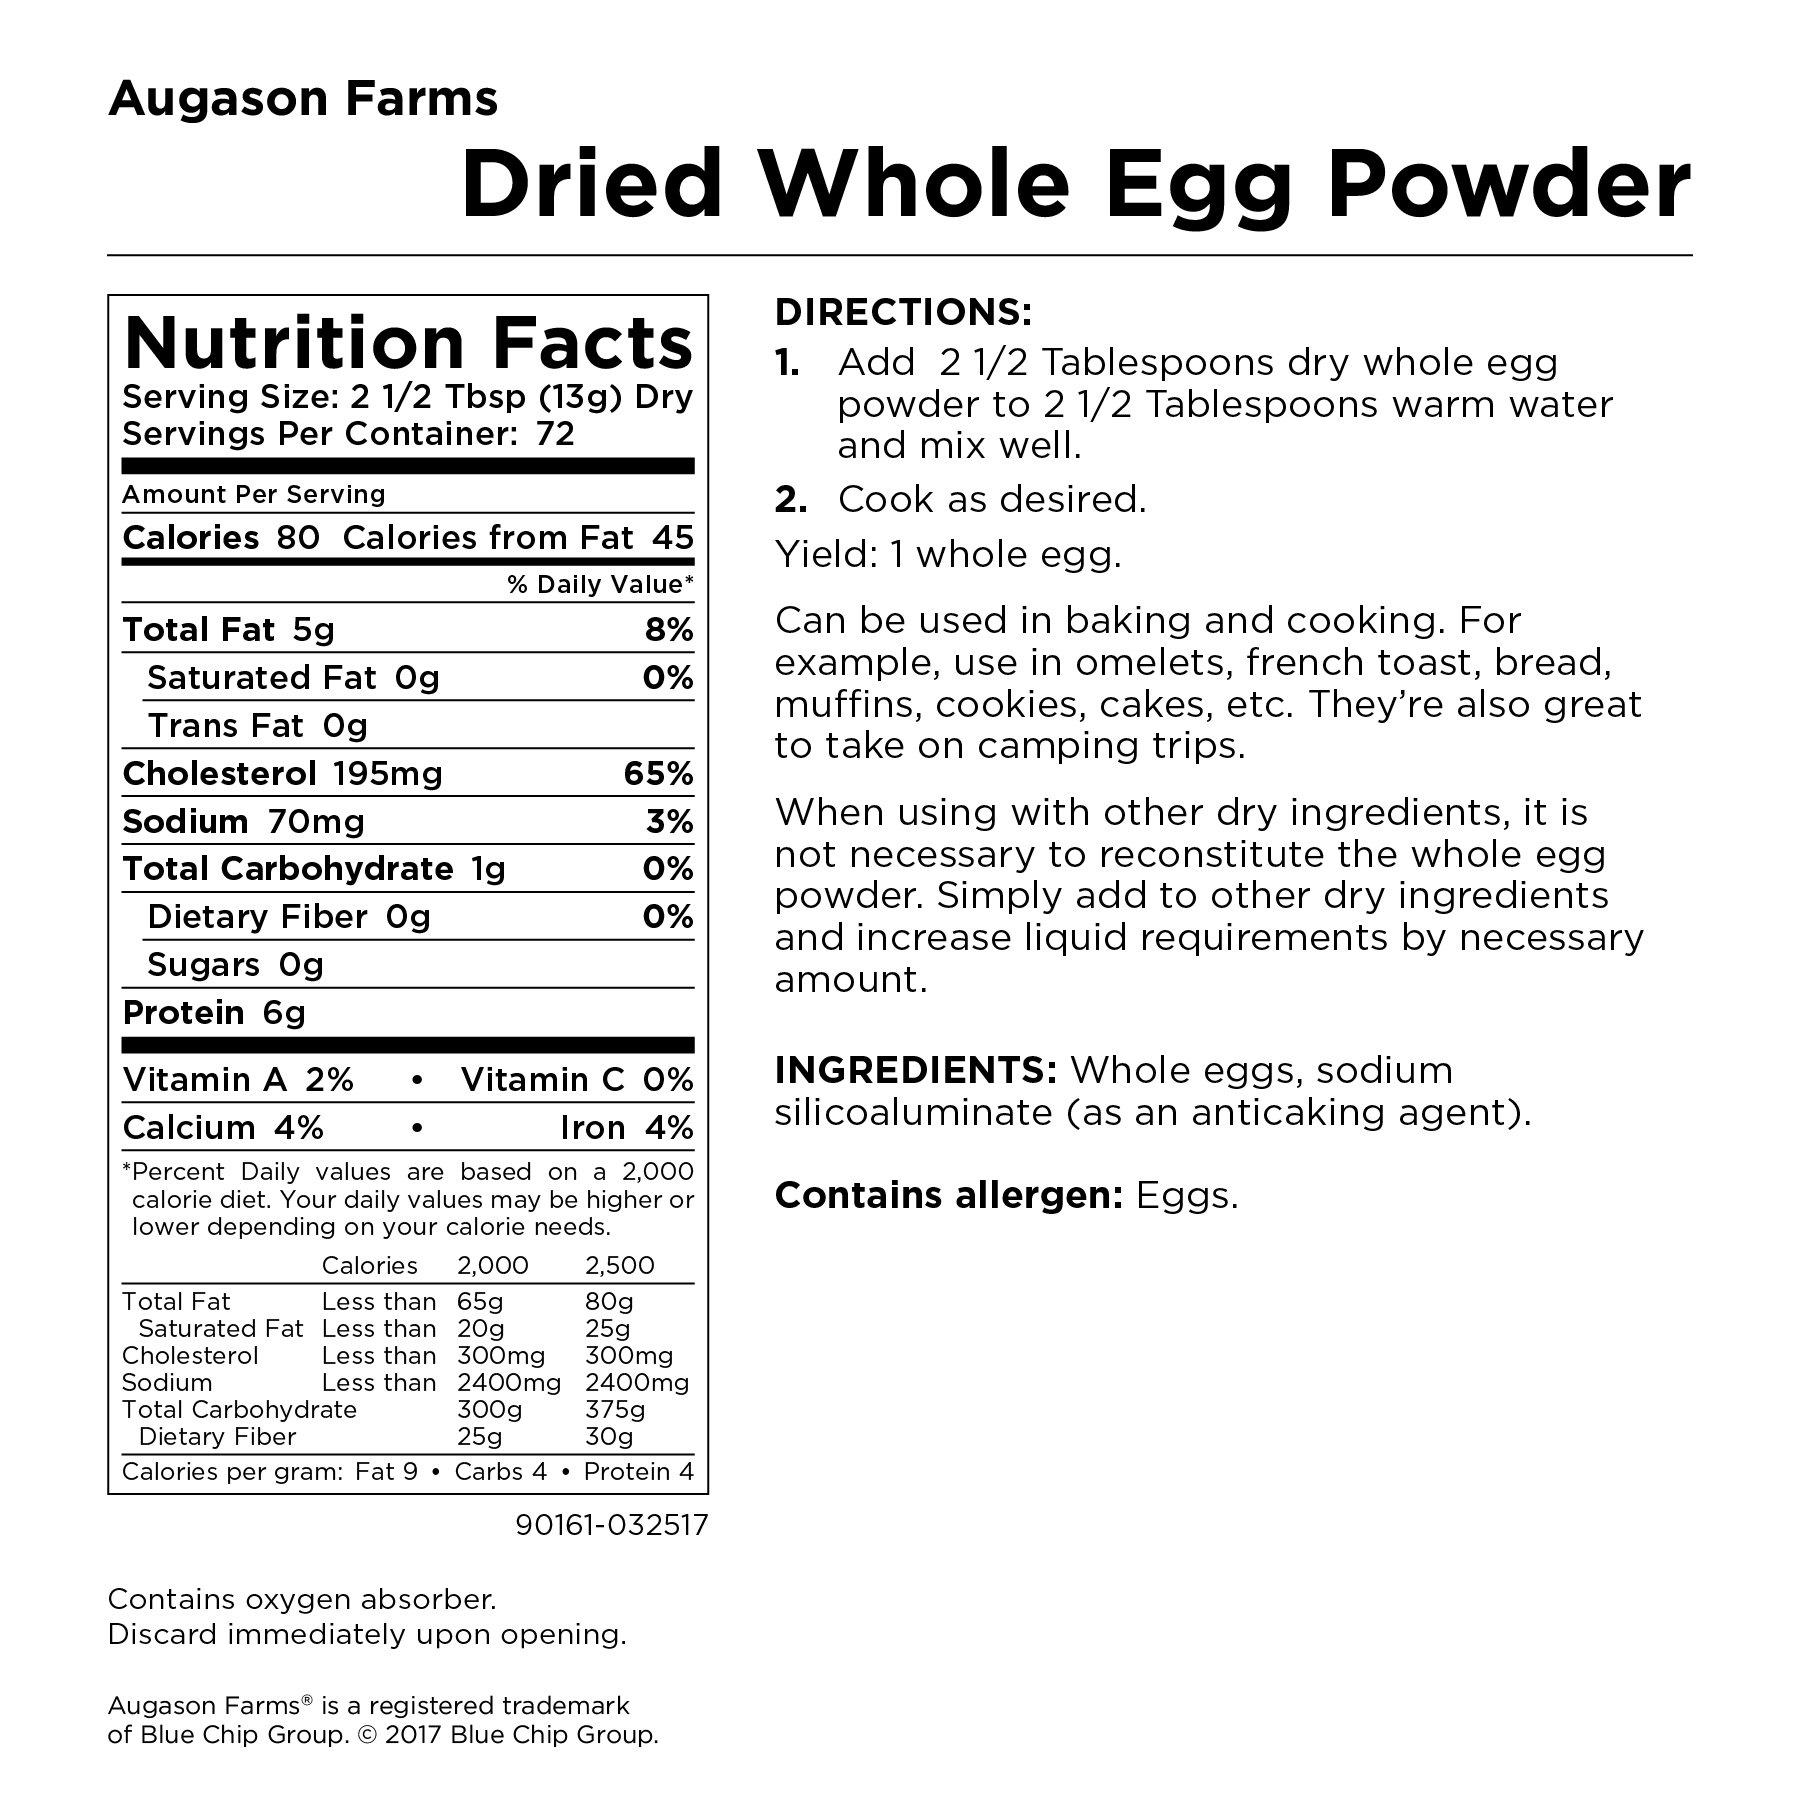 Augason Farms Dried Whole Egg Product 2 lbs 1 oz No. 10 Can by Augason Farms (Image #5)